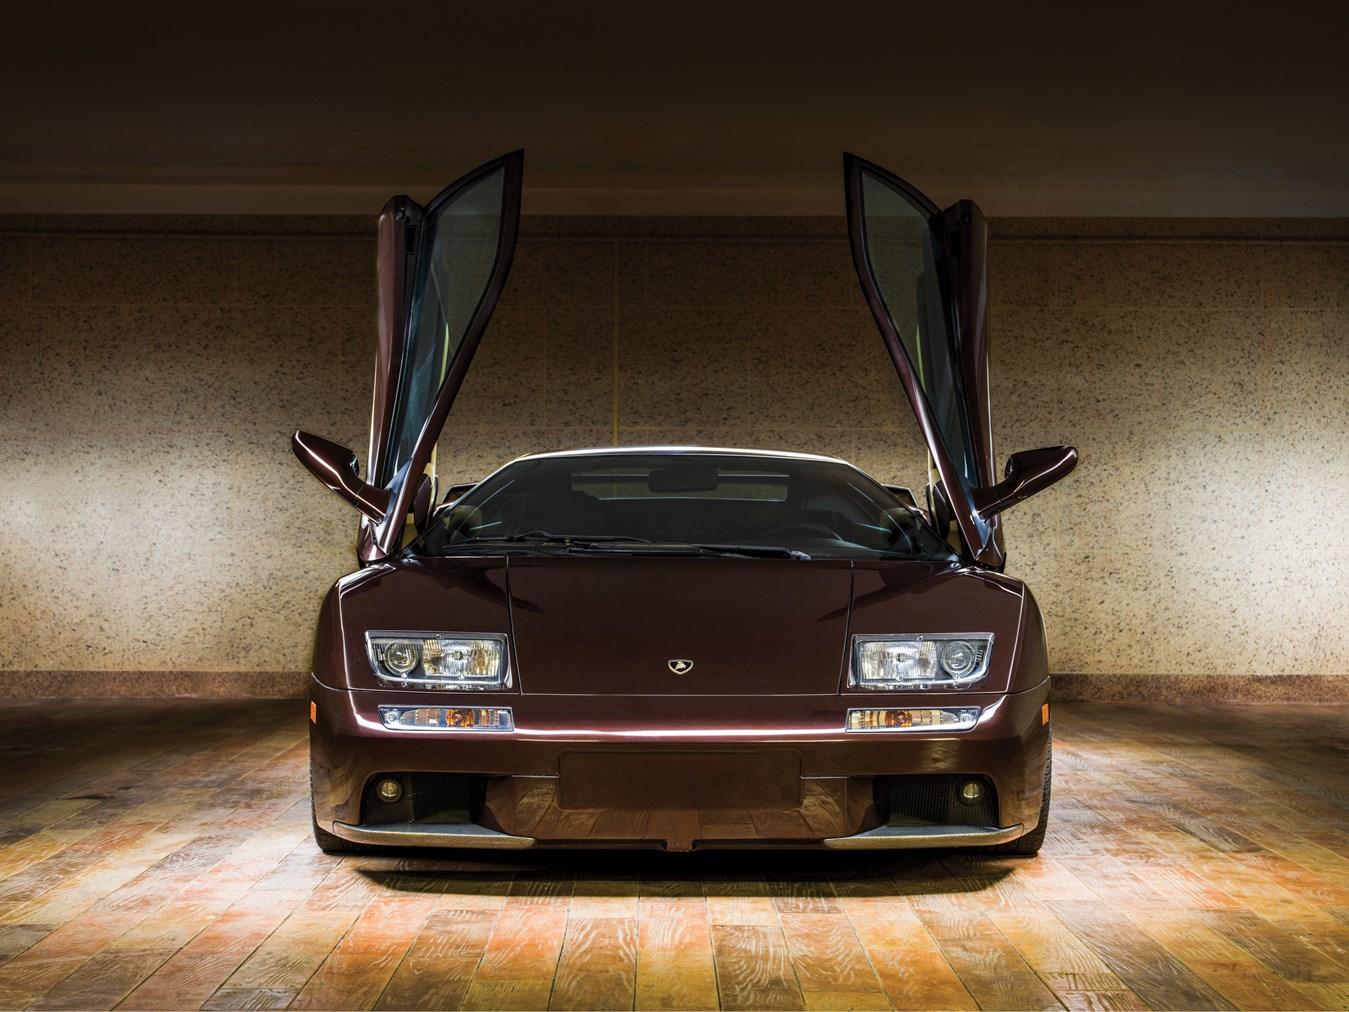 2001 Lamborghini Diablo VT 6.0 SE